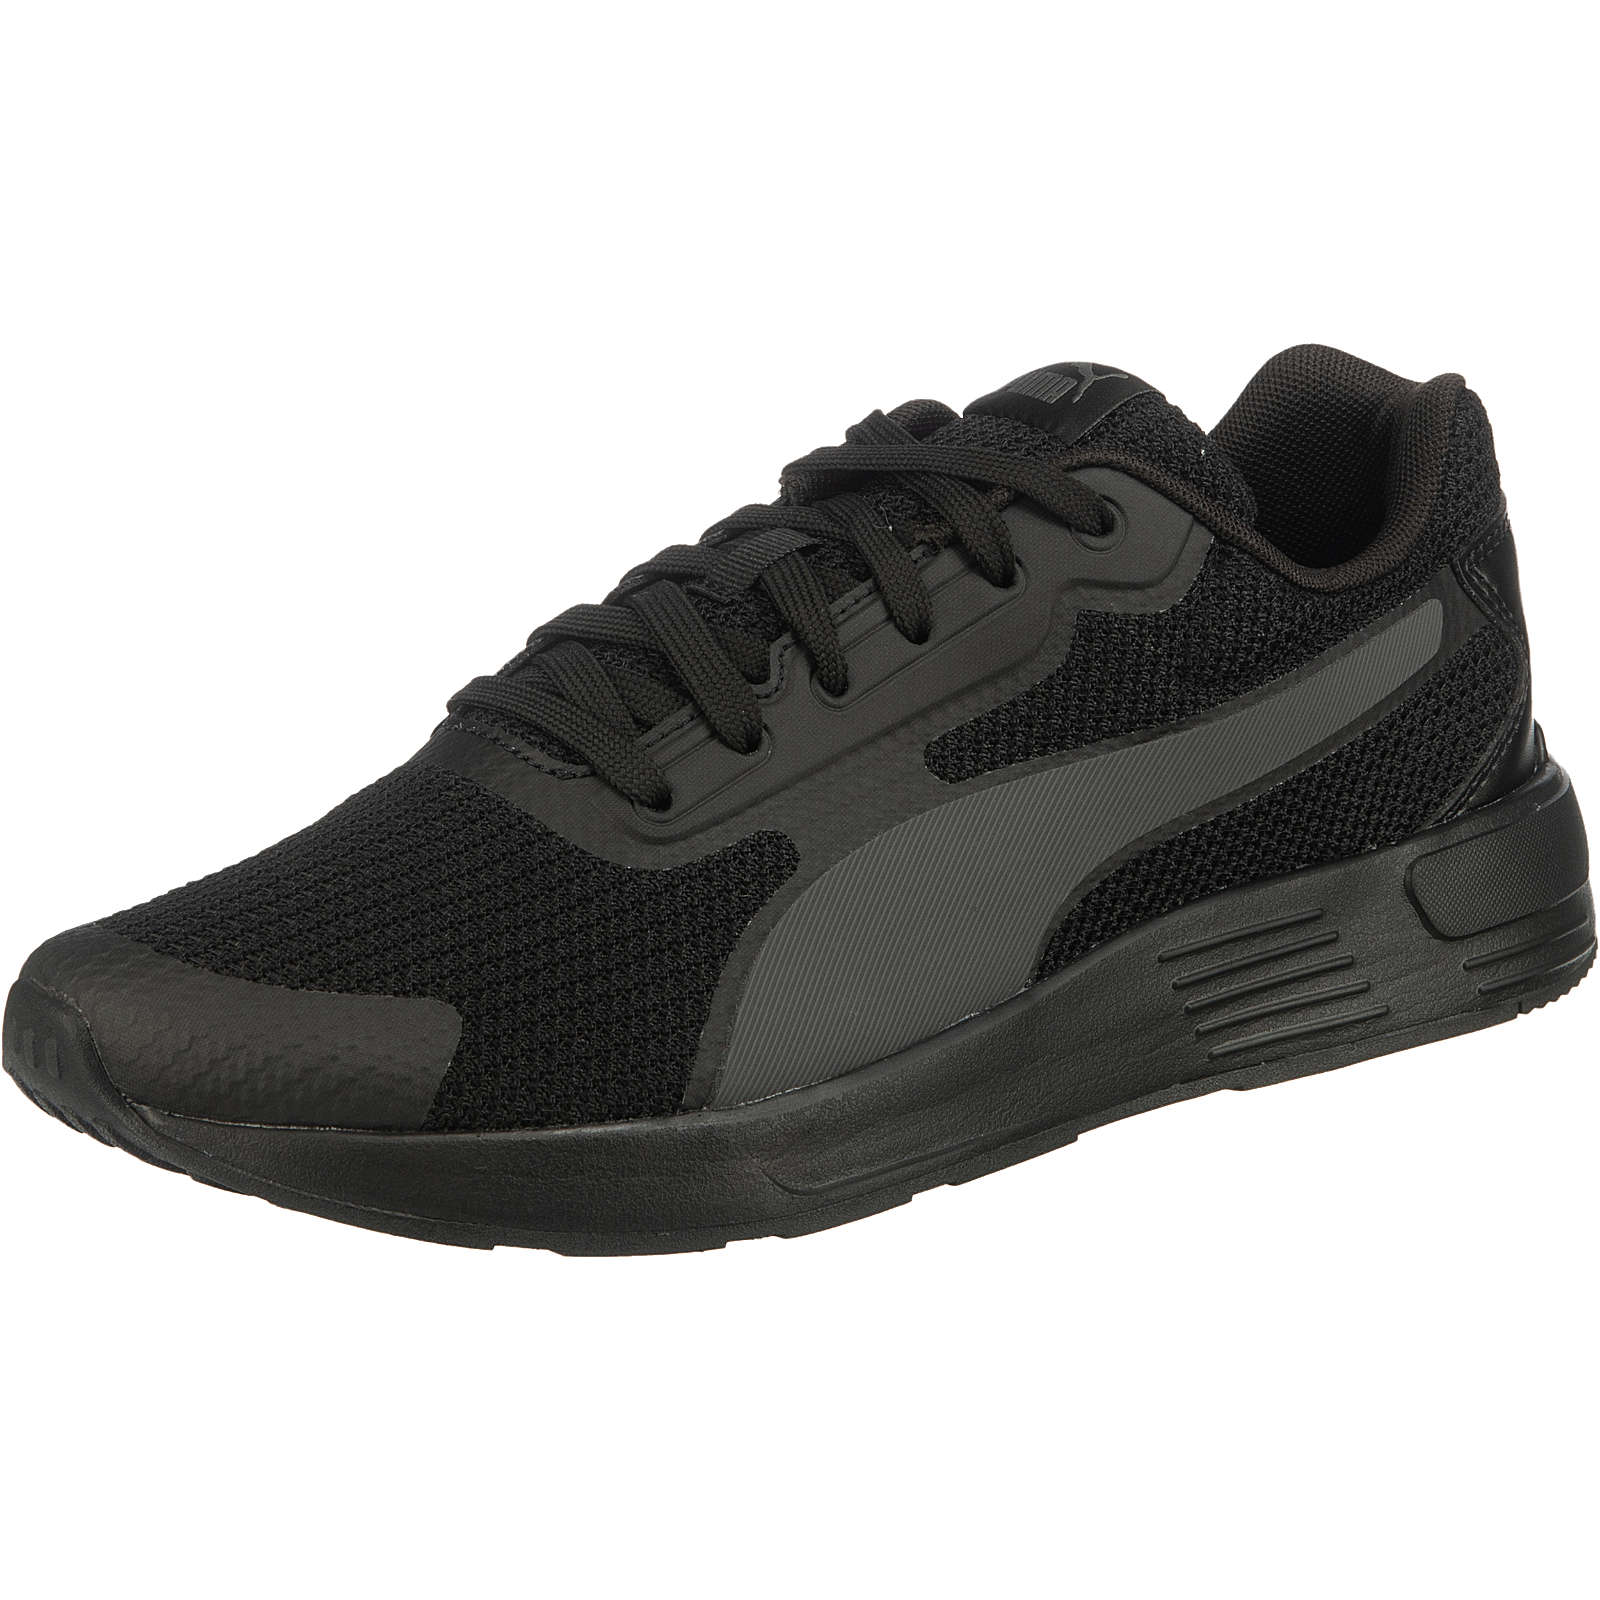 puma Taper sportschoenen, Zwart44,5